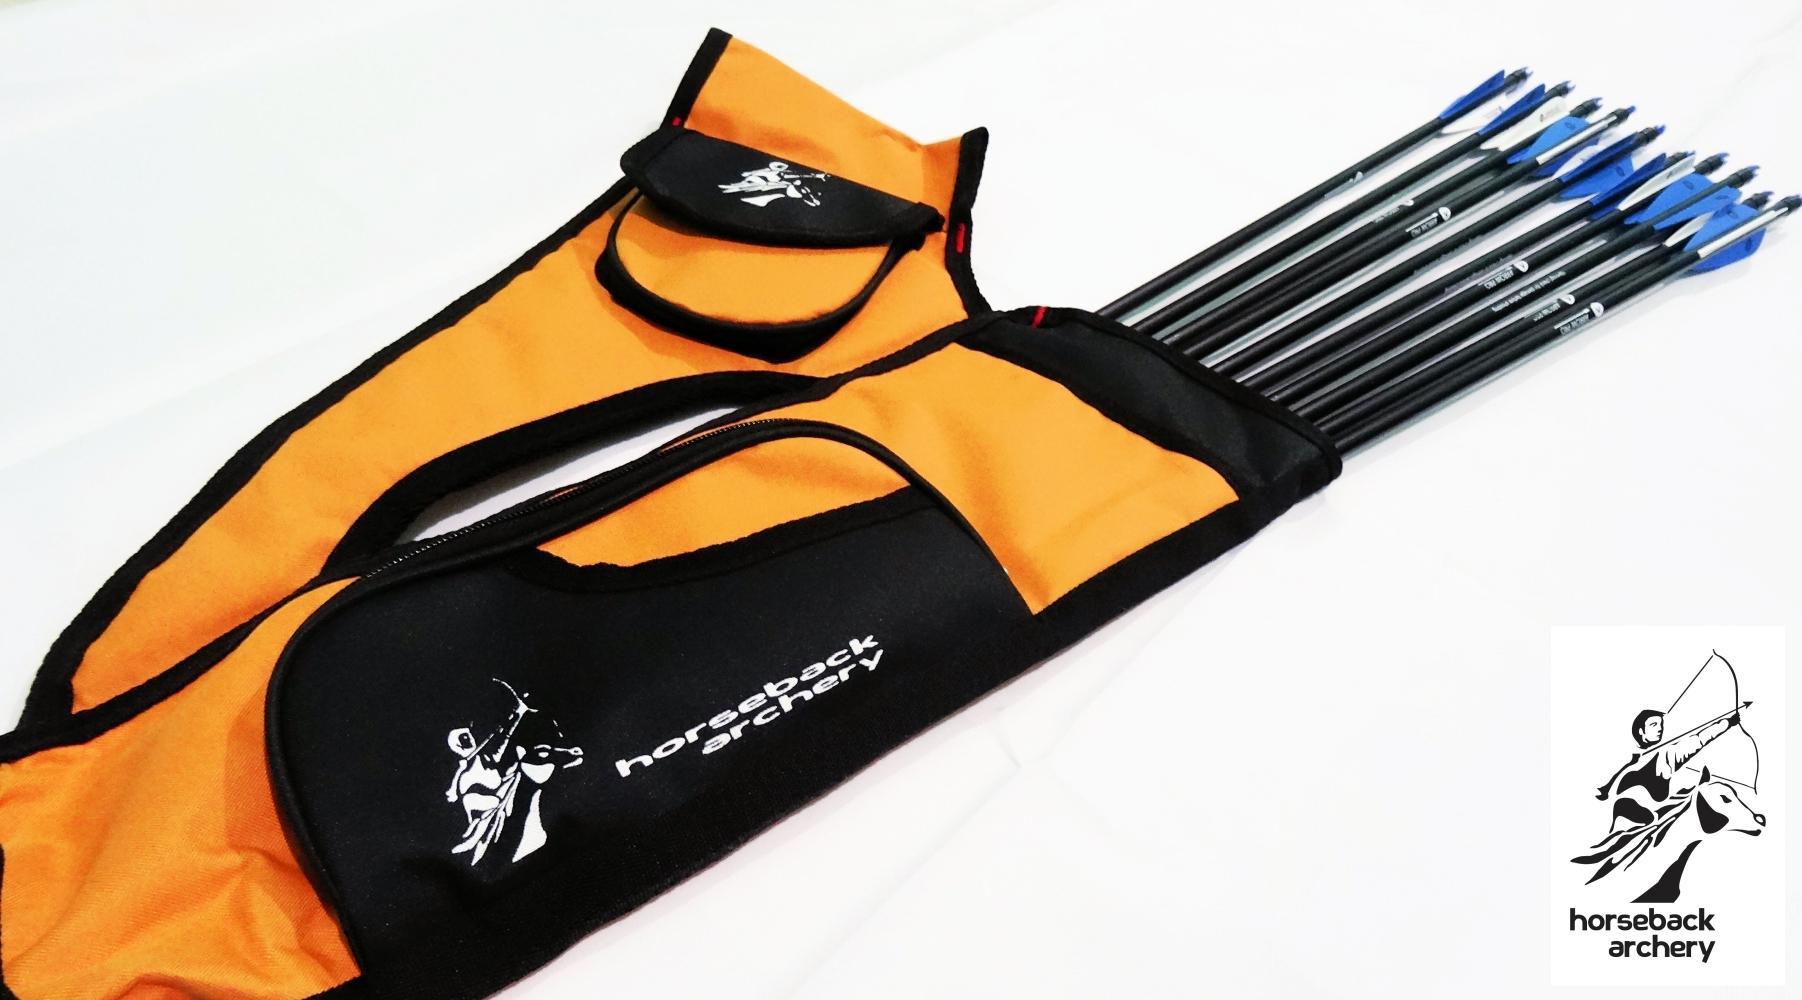 Jualan Promo Mainan Olahraga Memanah Panah Panahan Edukasi Ukuran Anak Quiver Pinggang Tas Ringan Nyaman Dipakai Latihan